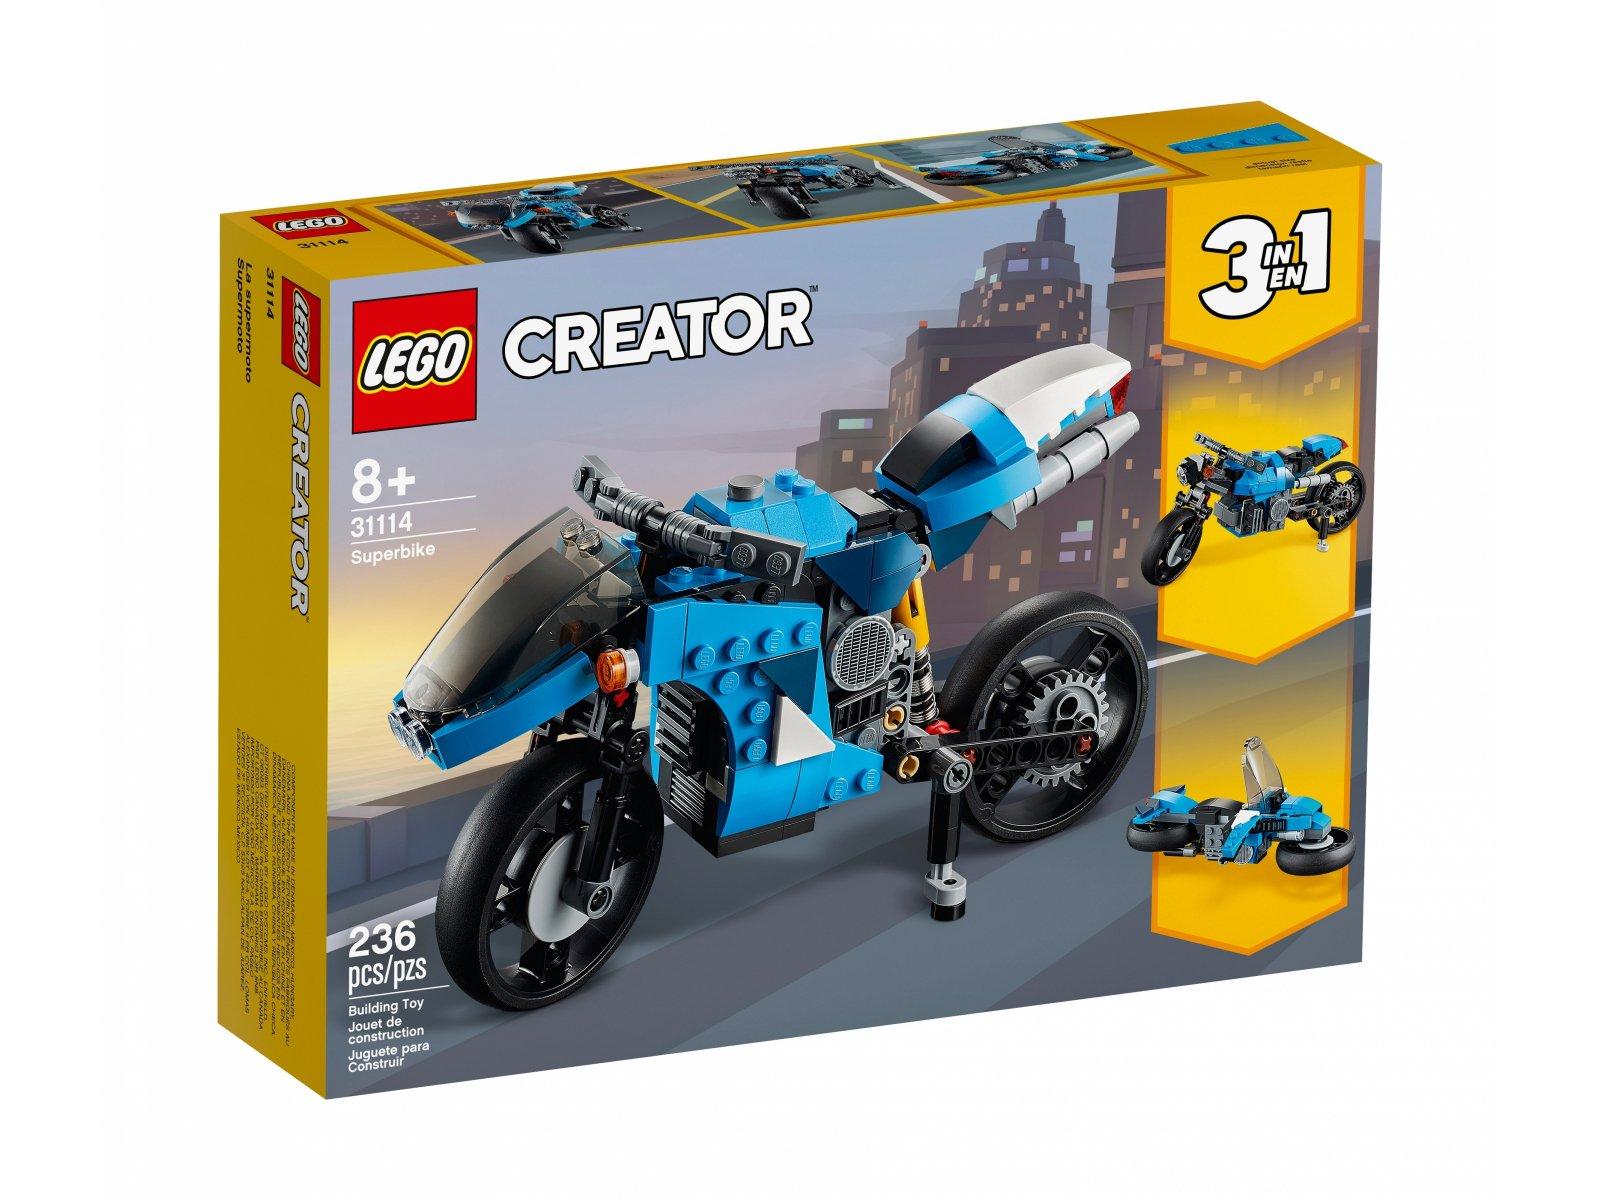 LEGO Creator 3 w 1 Supermotocykl 31114